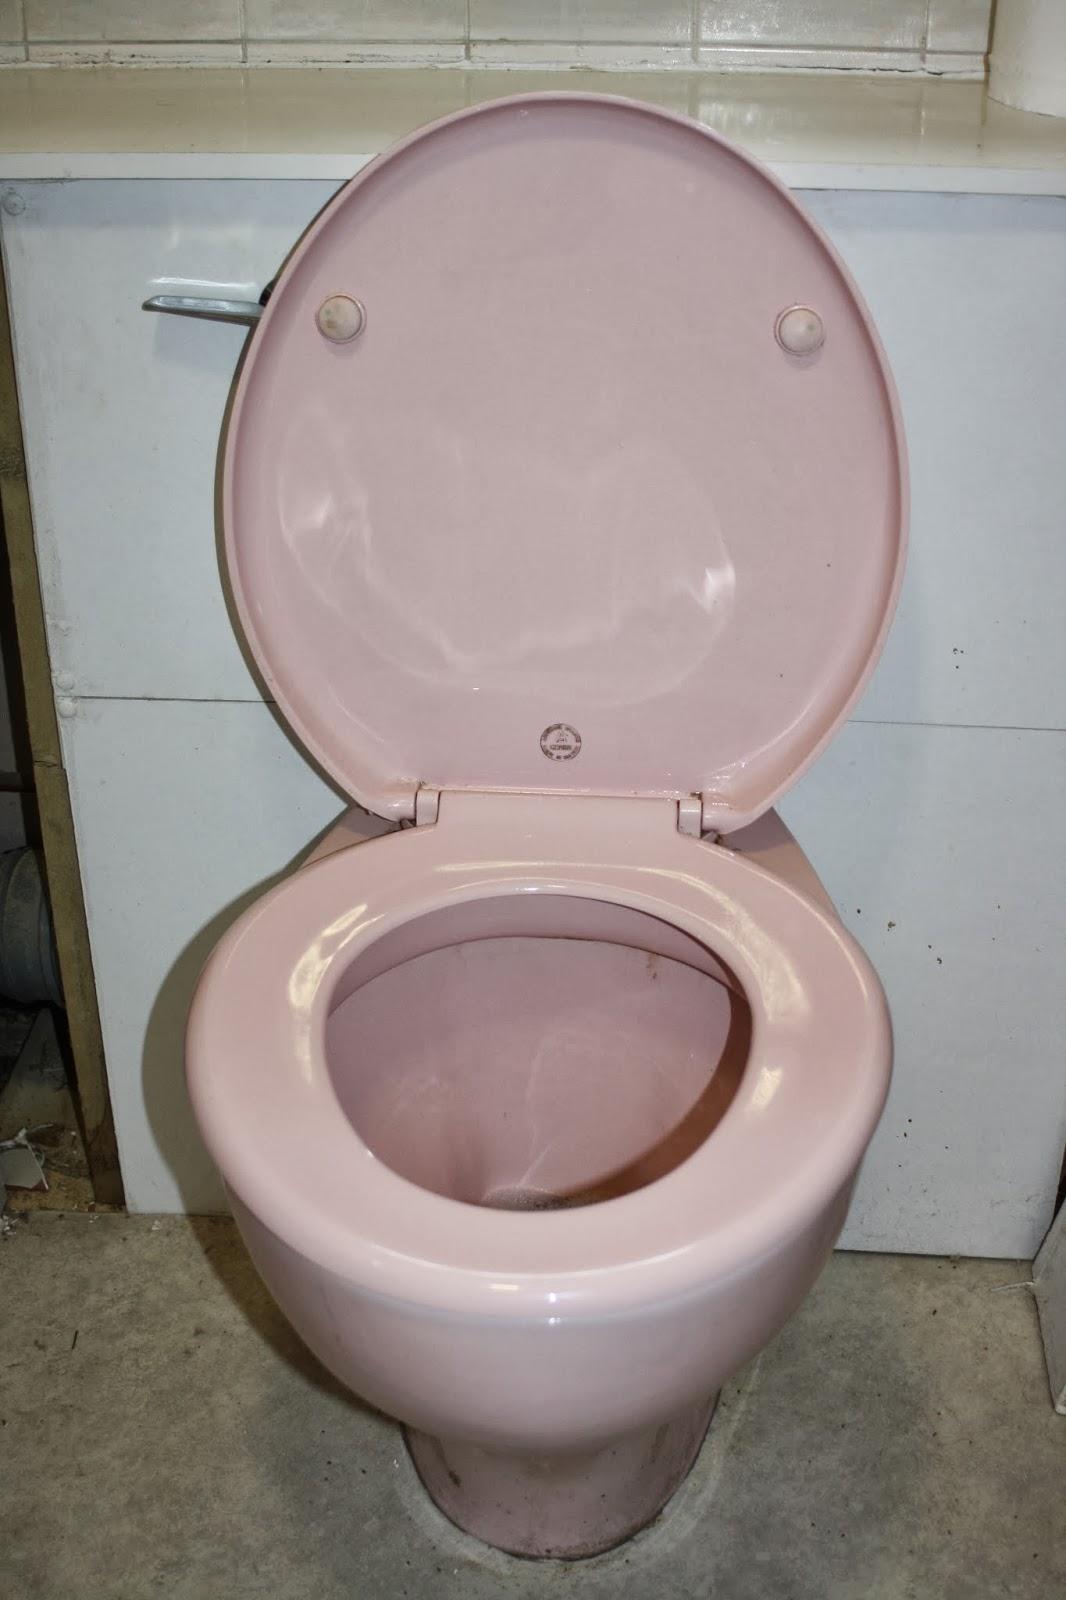 Toilet-new-house-bathroom